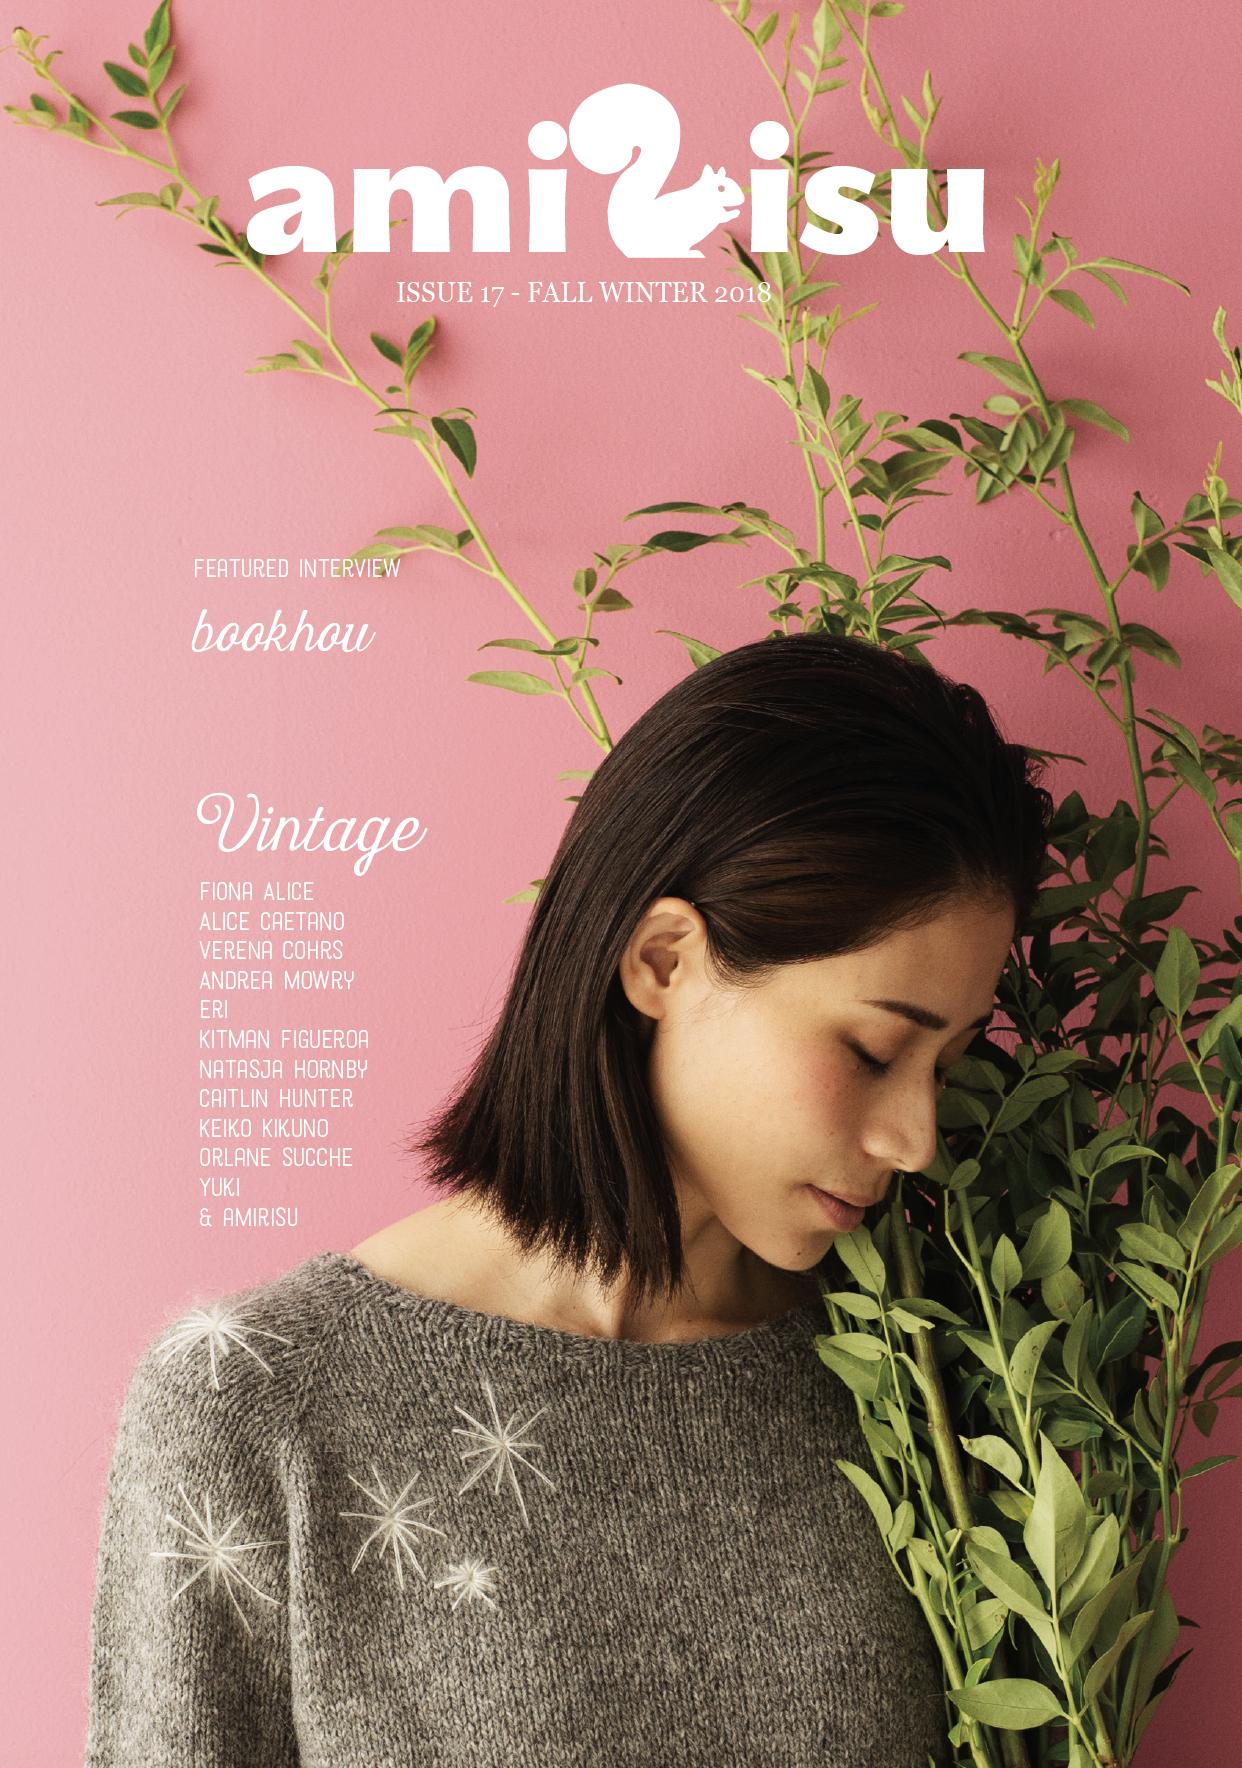 Amirisu - Issue 17